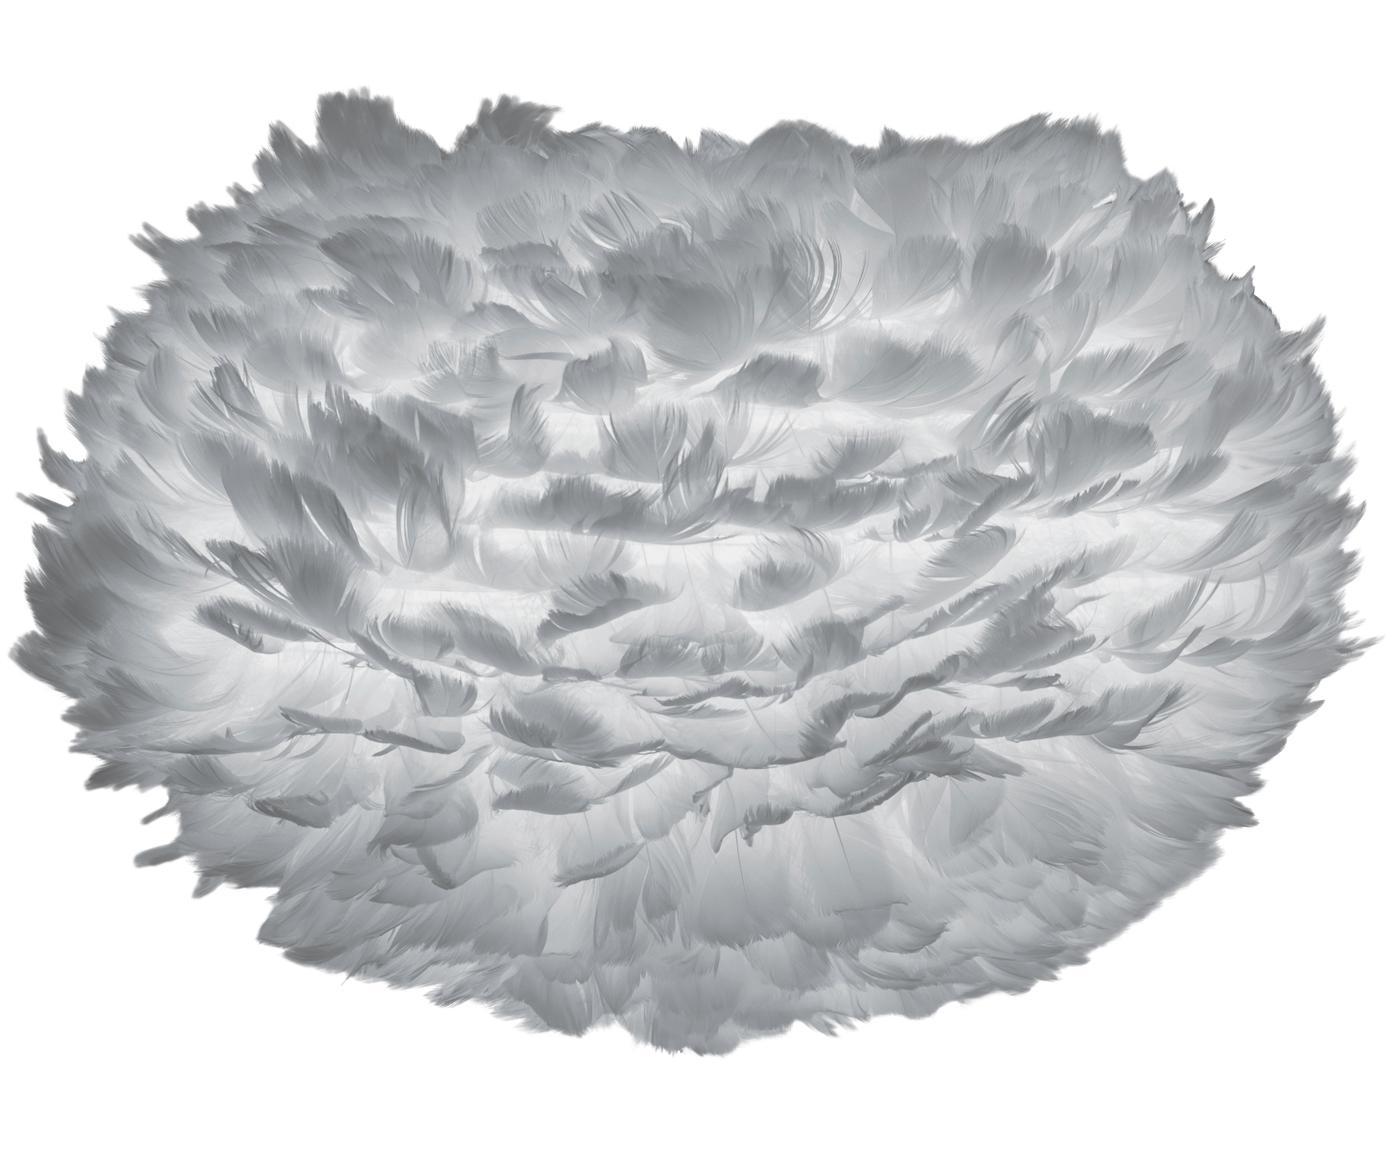 Lampenkap Eos, Ganzeveren, staal, Lichtgrijs, Ø 45 x H 30 cm